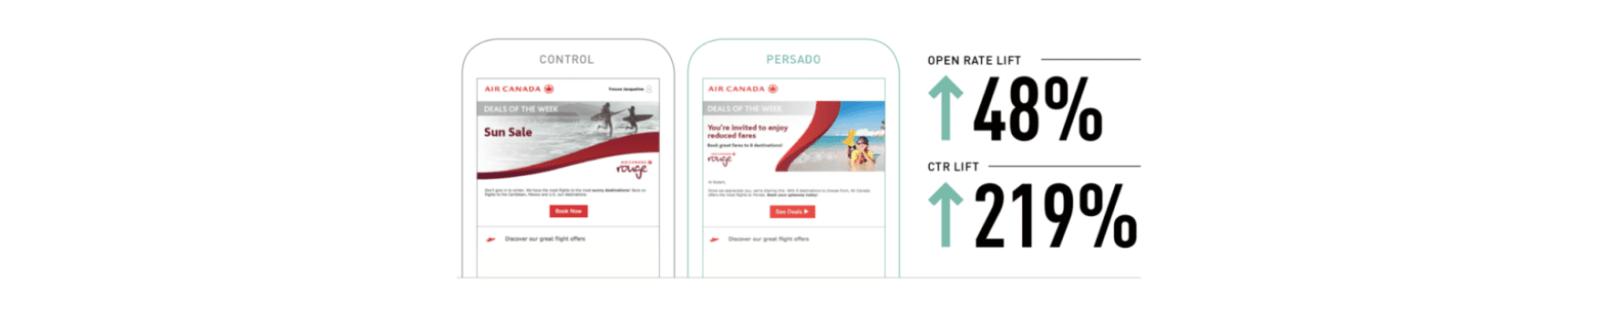 Digital marketing trends recommendations